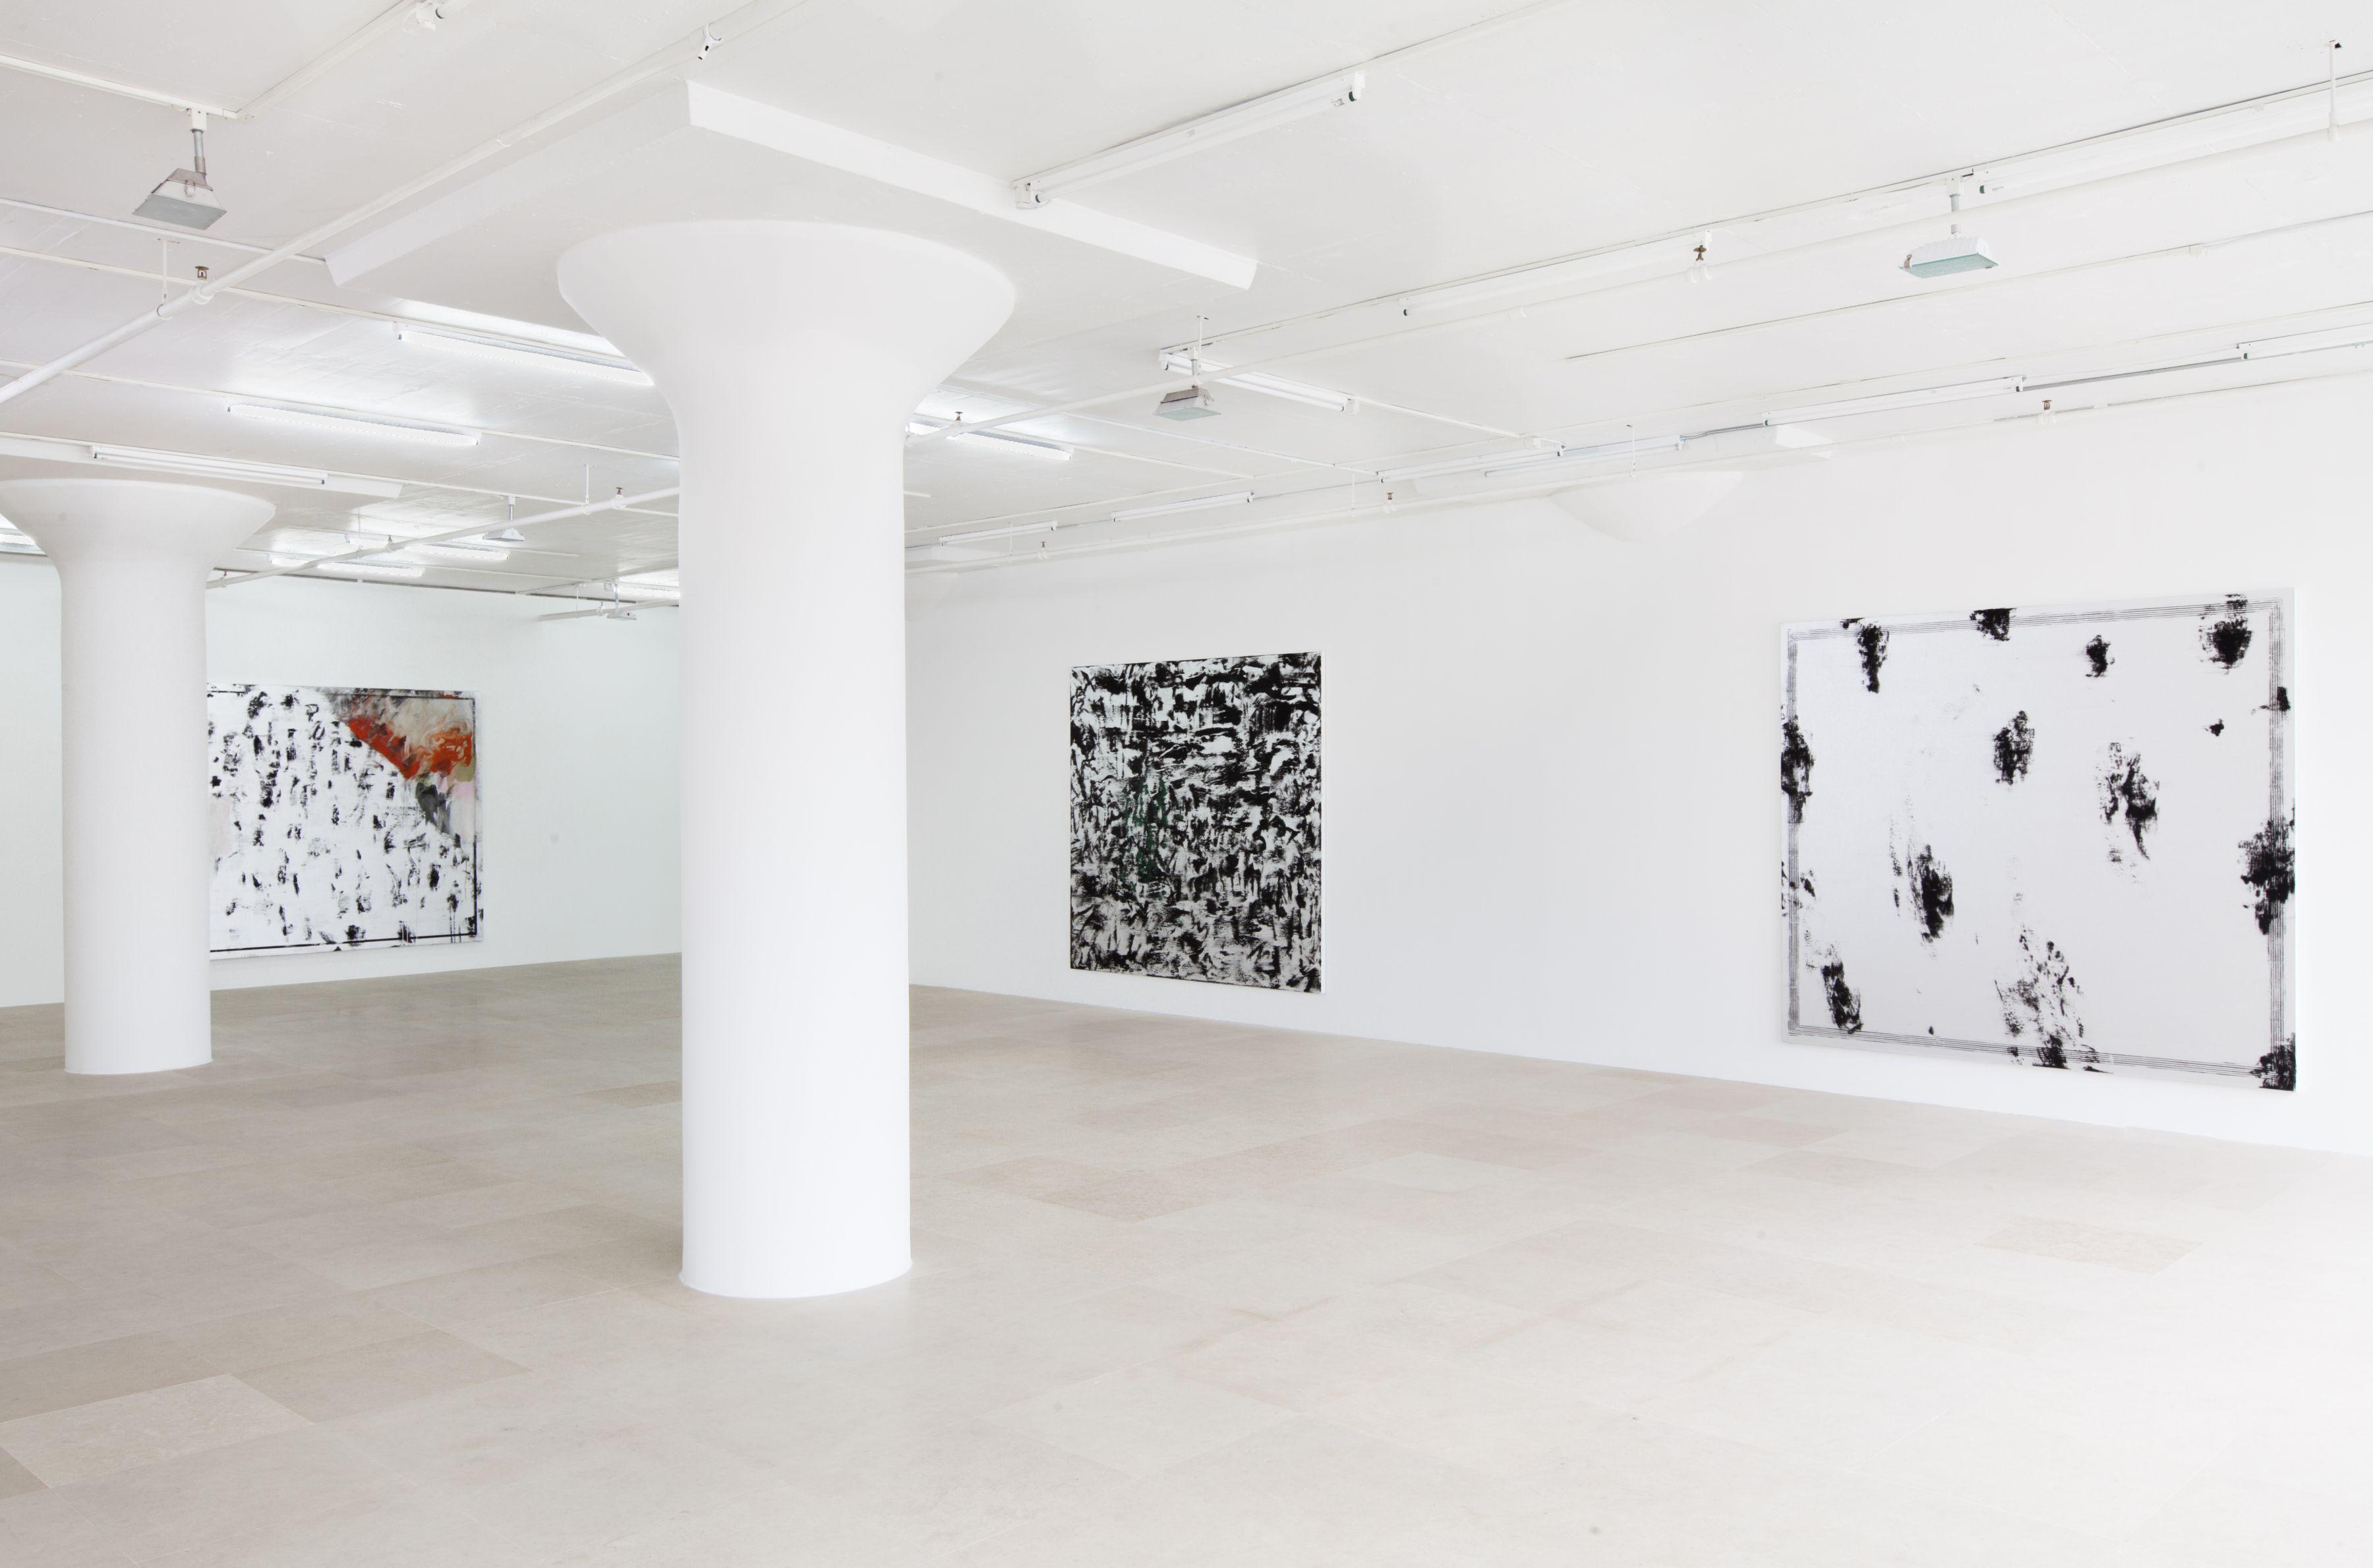 jacqueline humphries Installation view, Greene Naftali, New York, 2012